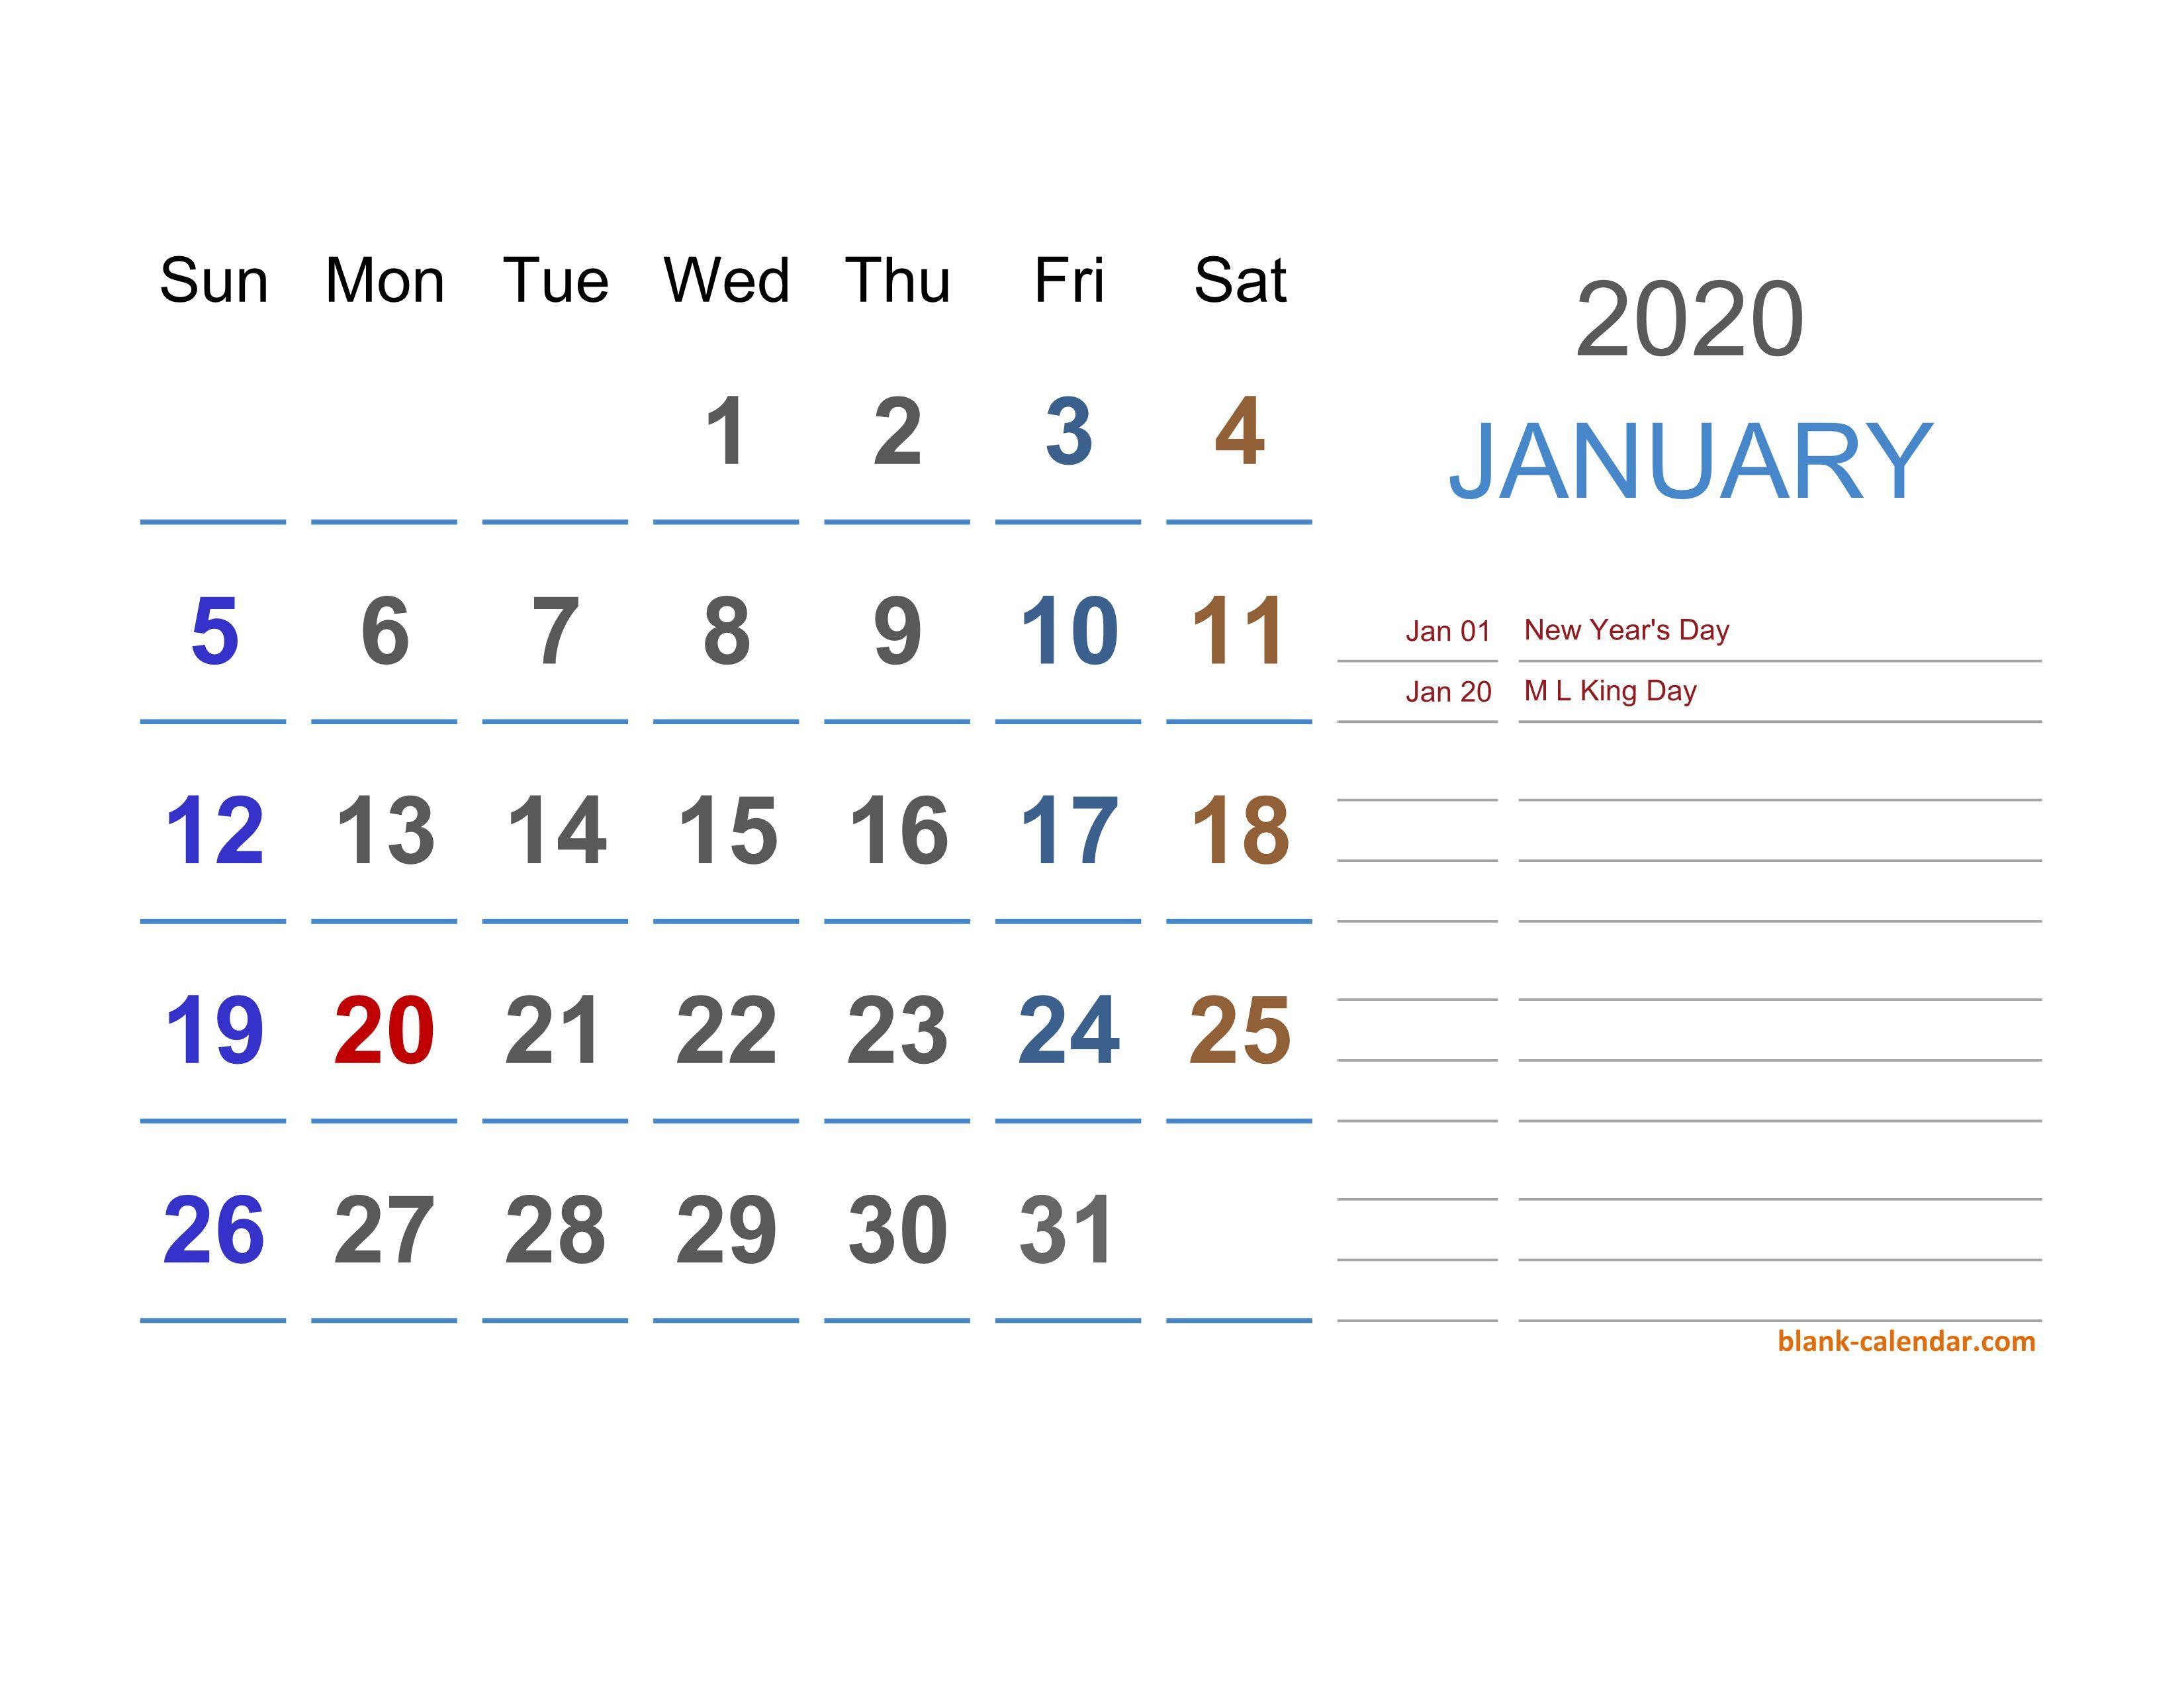 001 Fascinating Microsoft Calendar Template 2020 High Resolution  Publisher Office FreeFull